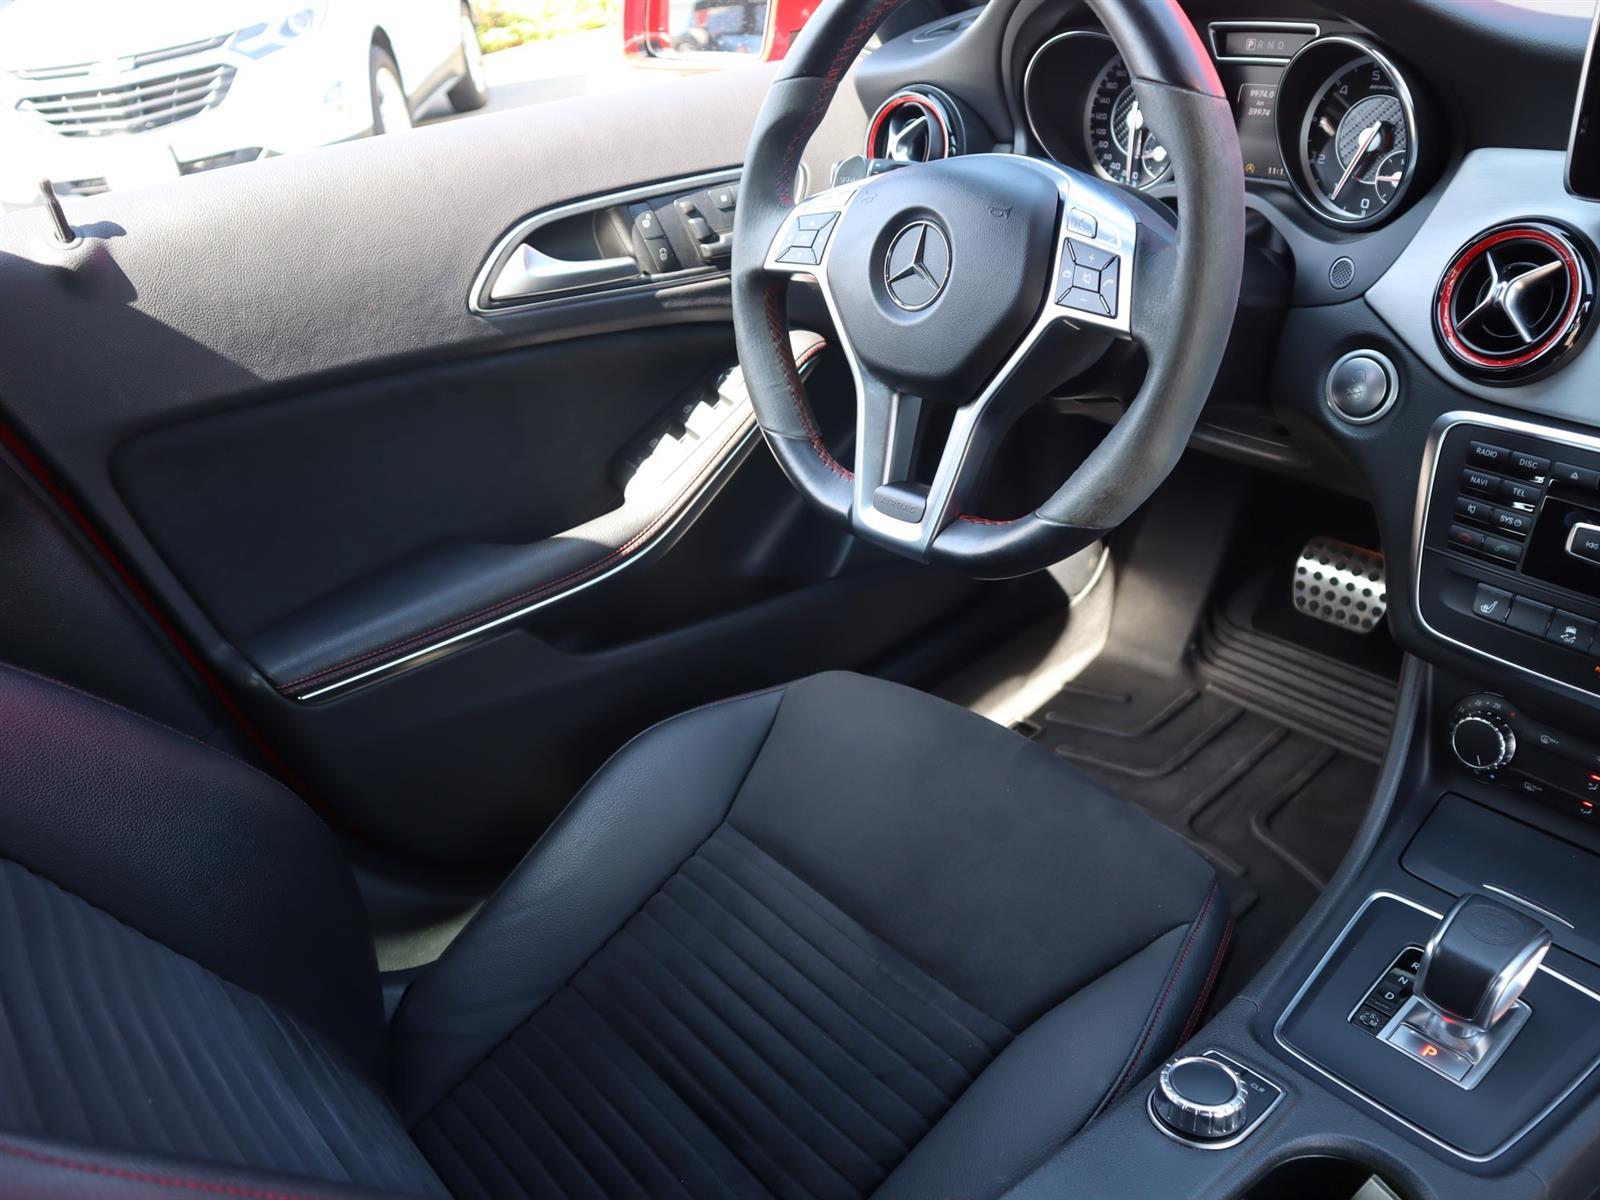 2015 Mercedes-Benz GLA-CLASS GLA 45 AMG